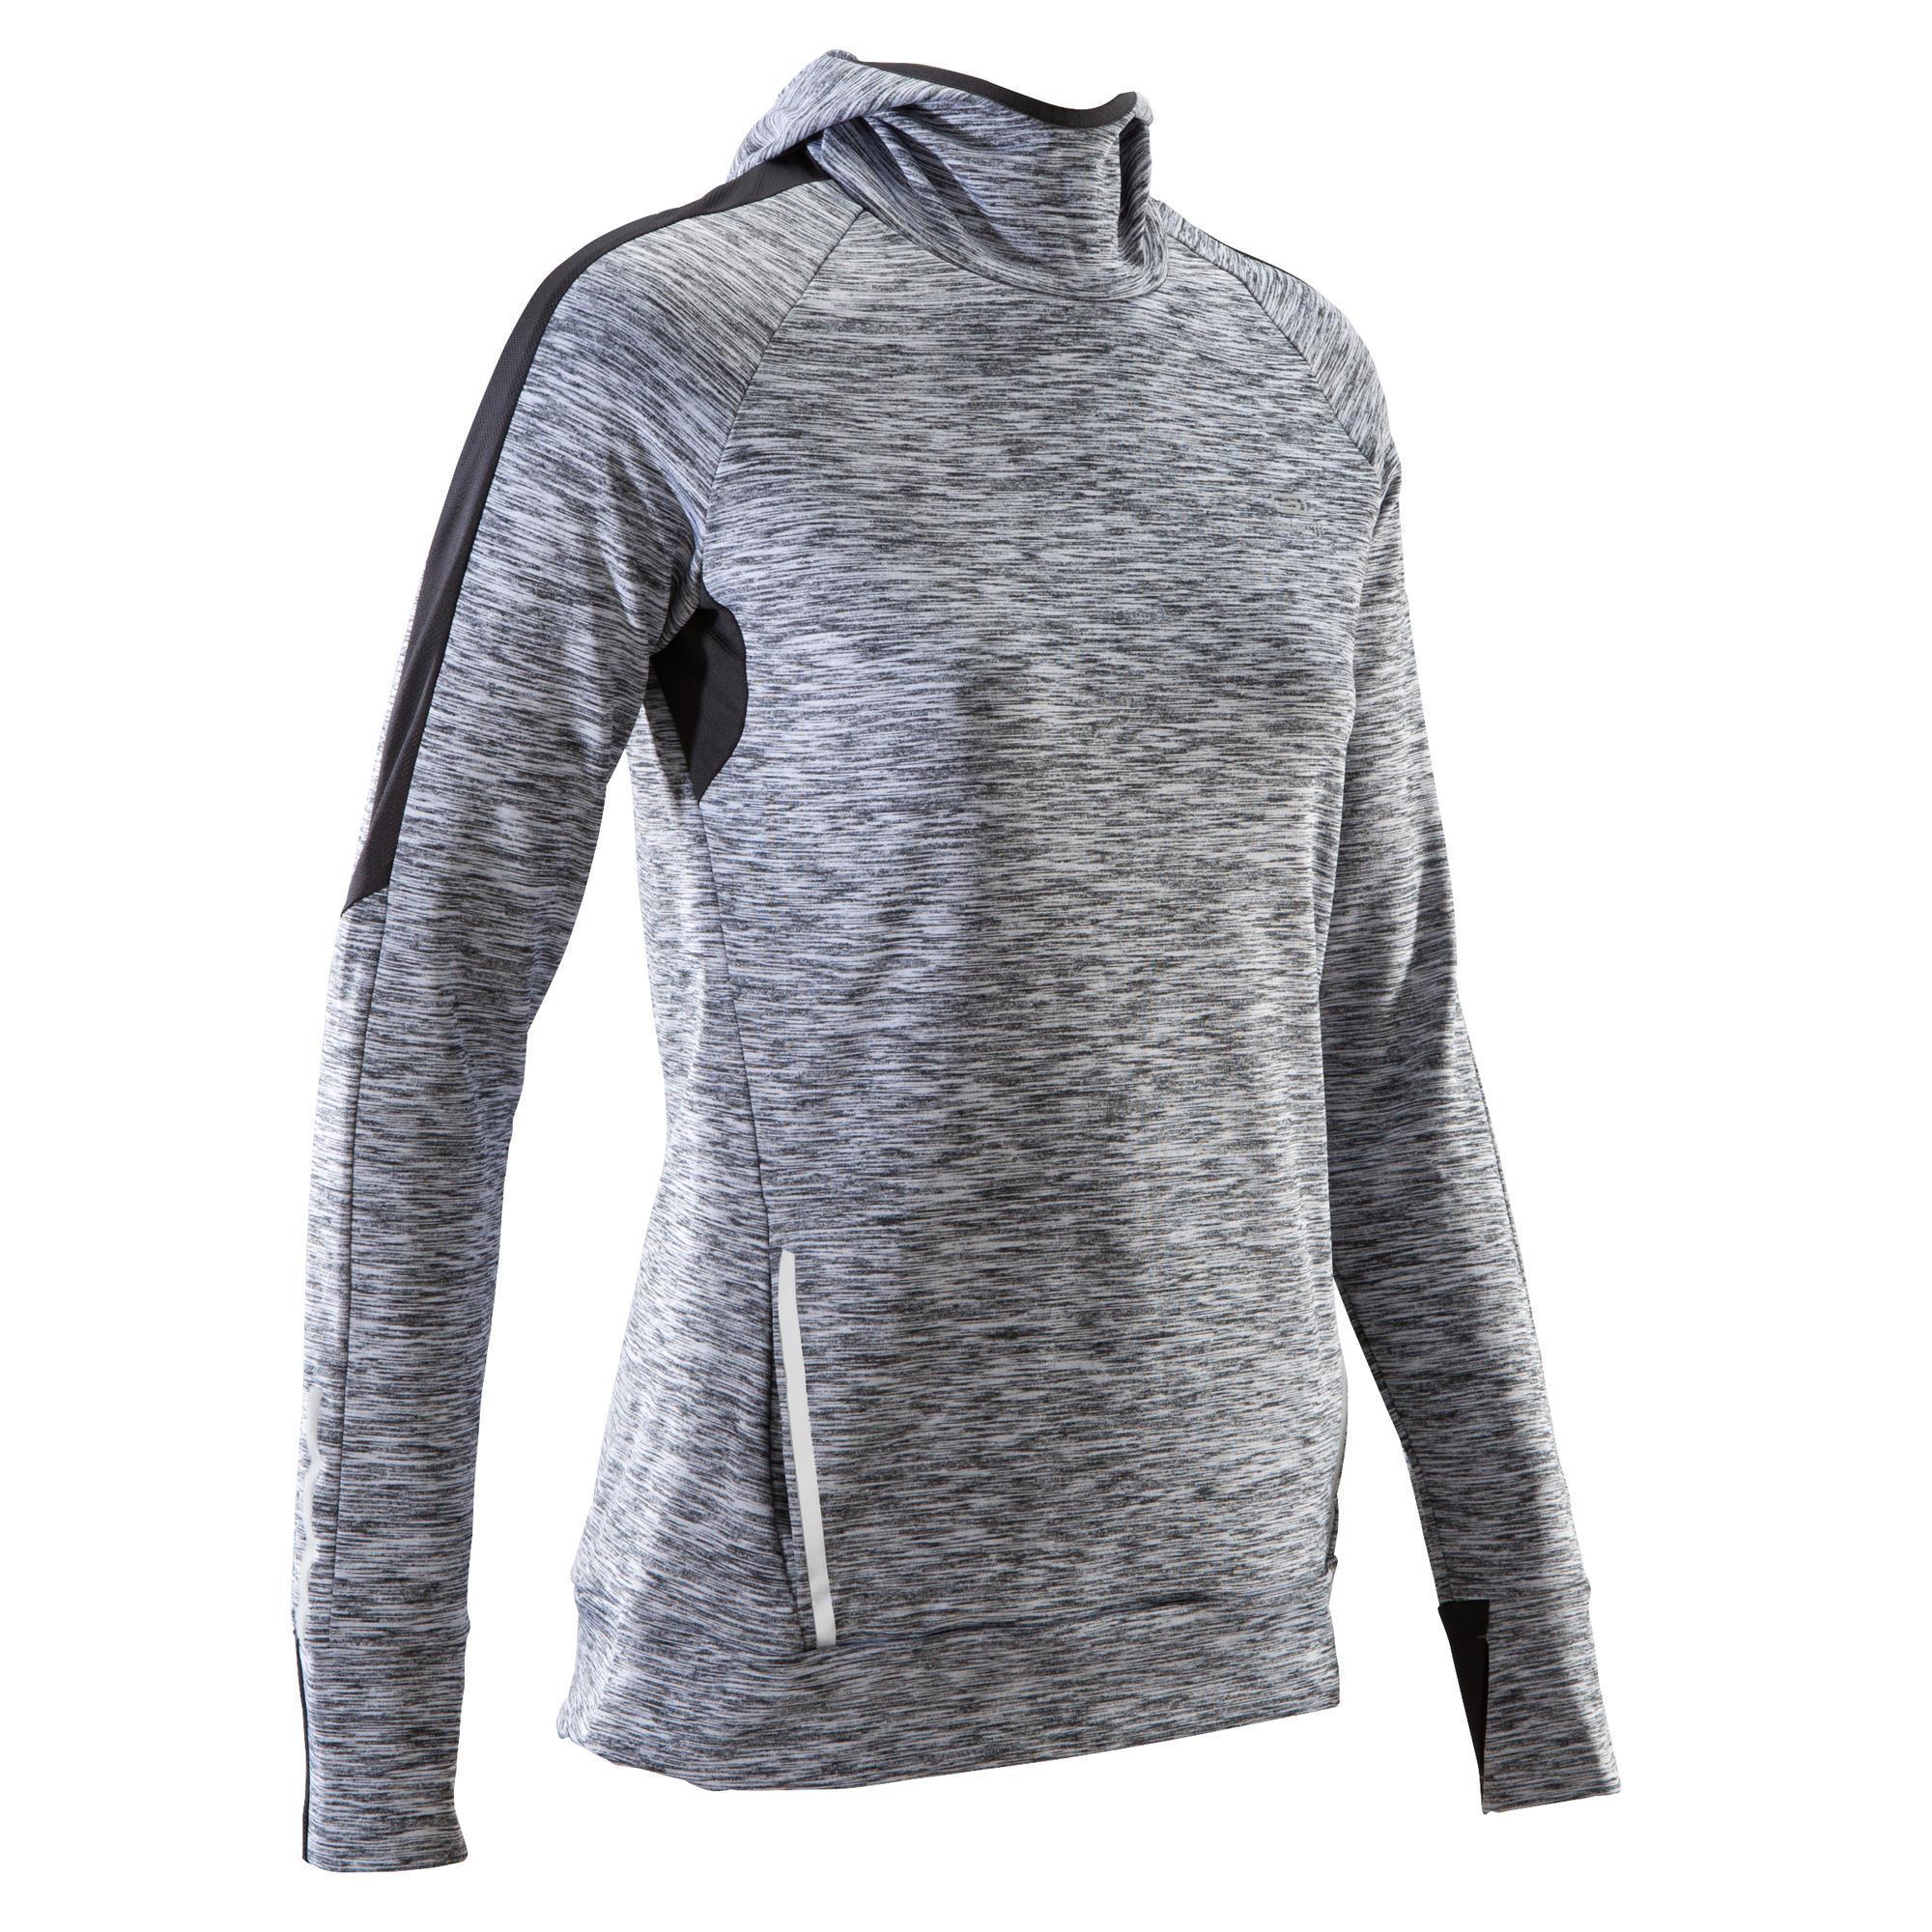 Kalenji Hardloopshirt met lange mouwen jogging dames Run Warm Hood gemêleerd grijs